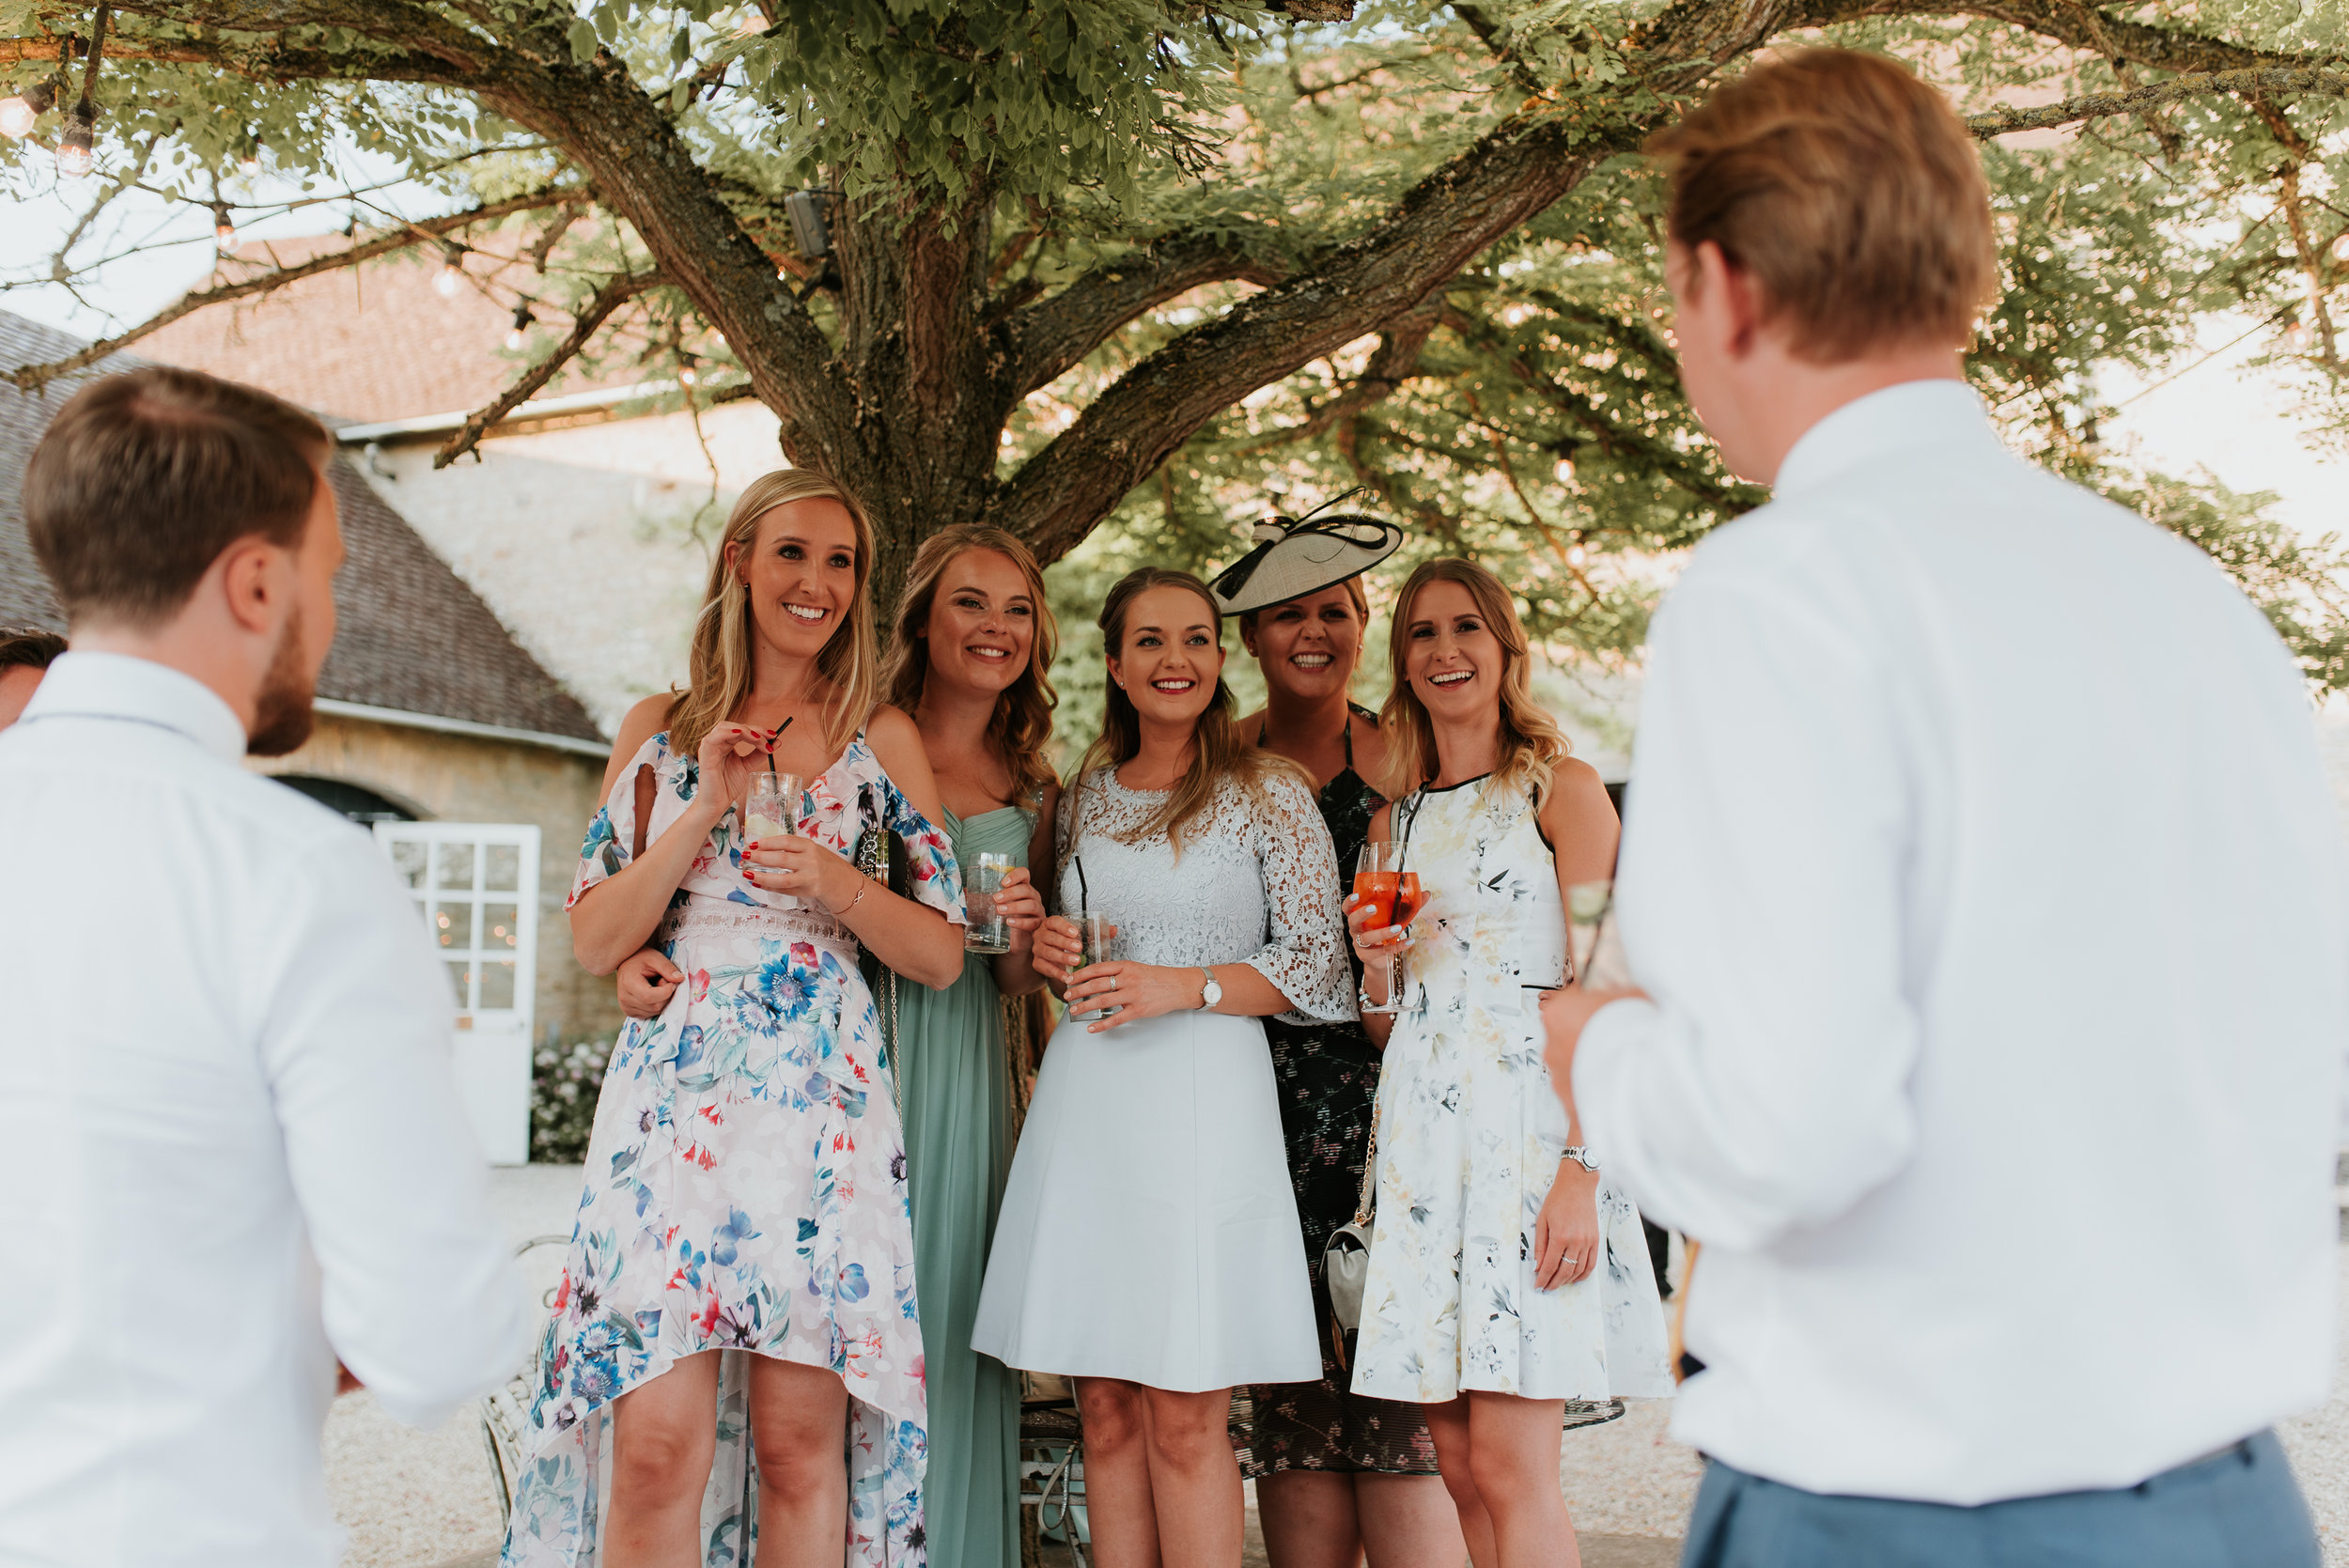 Oxfordshire-wedding-photographer-85.jpg